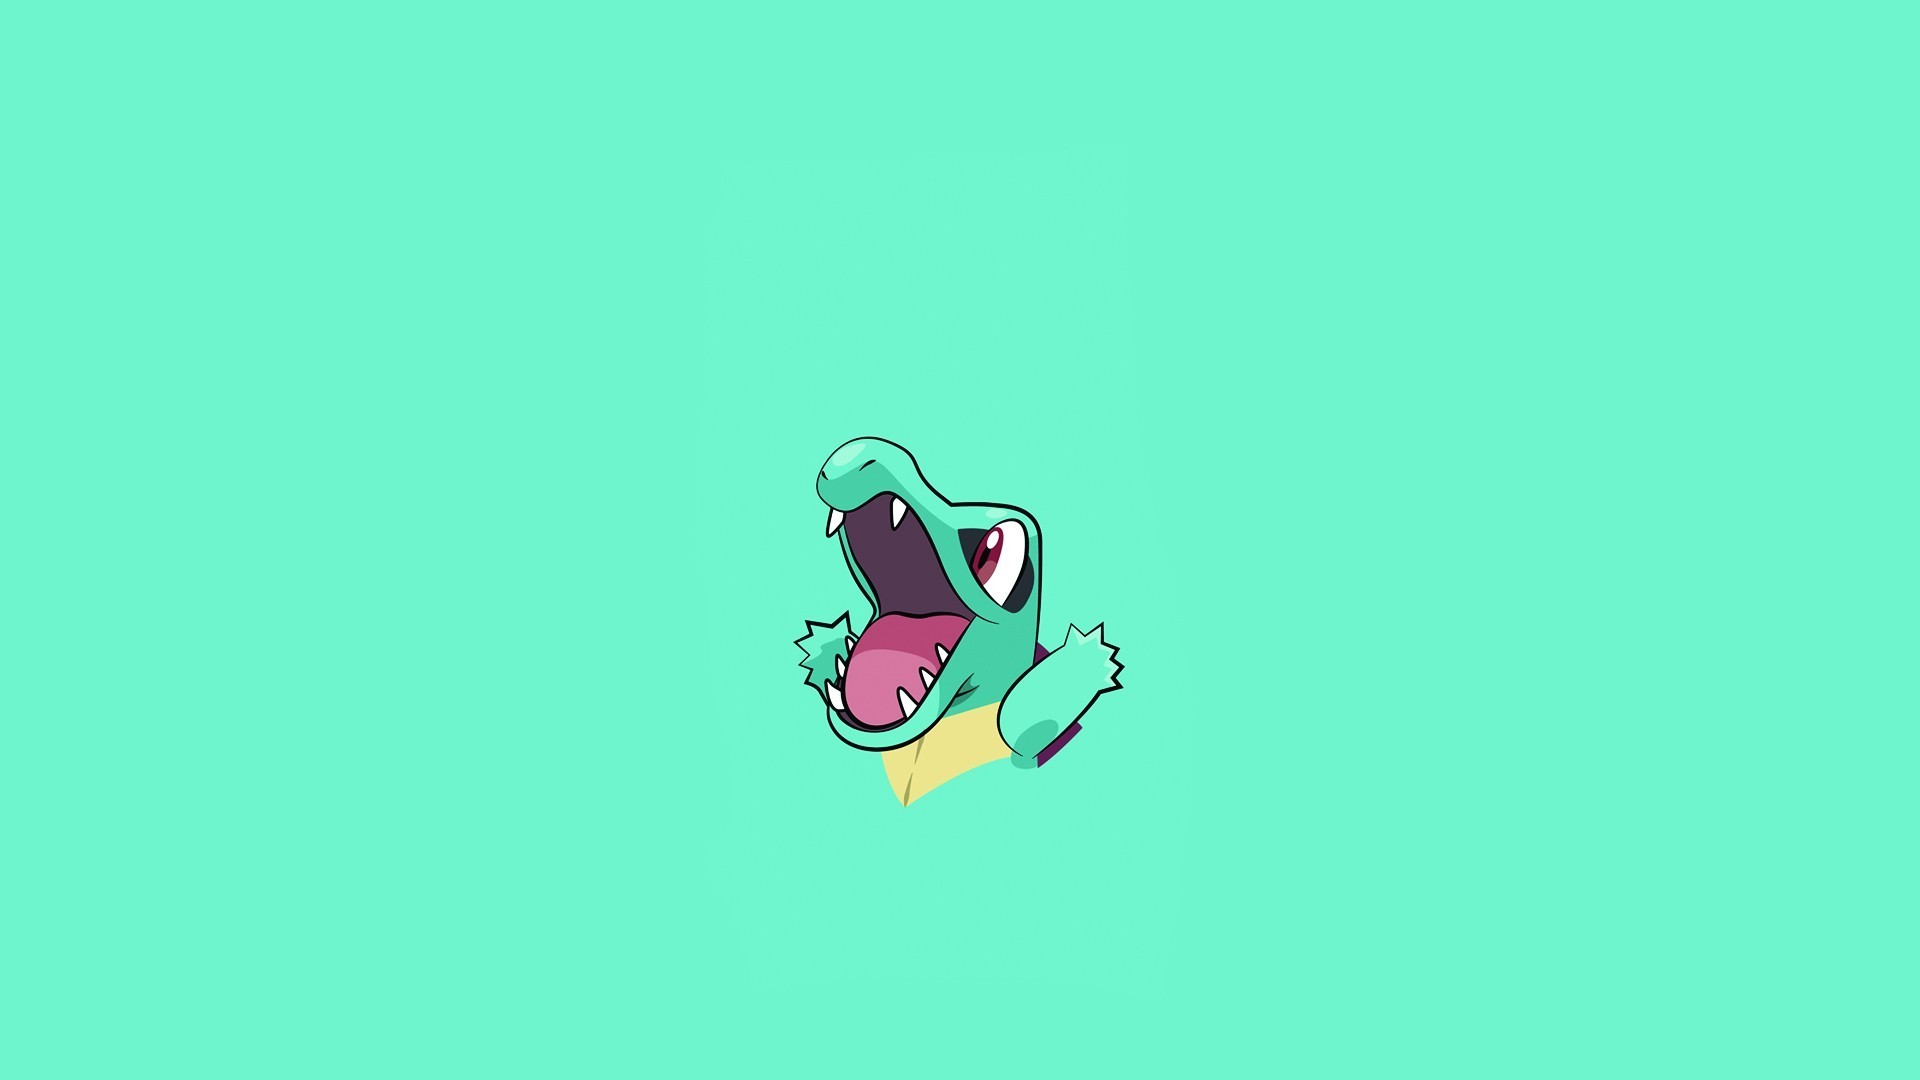 Pokemon Totodile Minimalism Hd Artist 4k Wallpapers Images